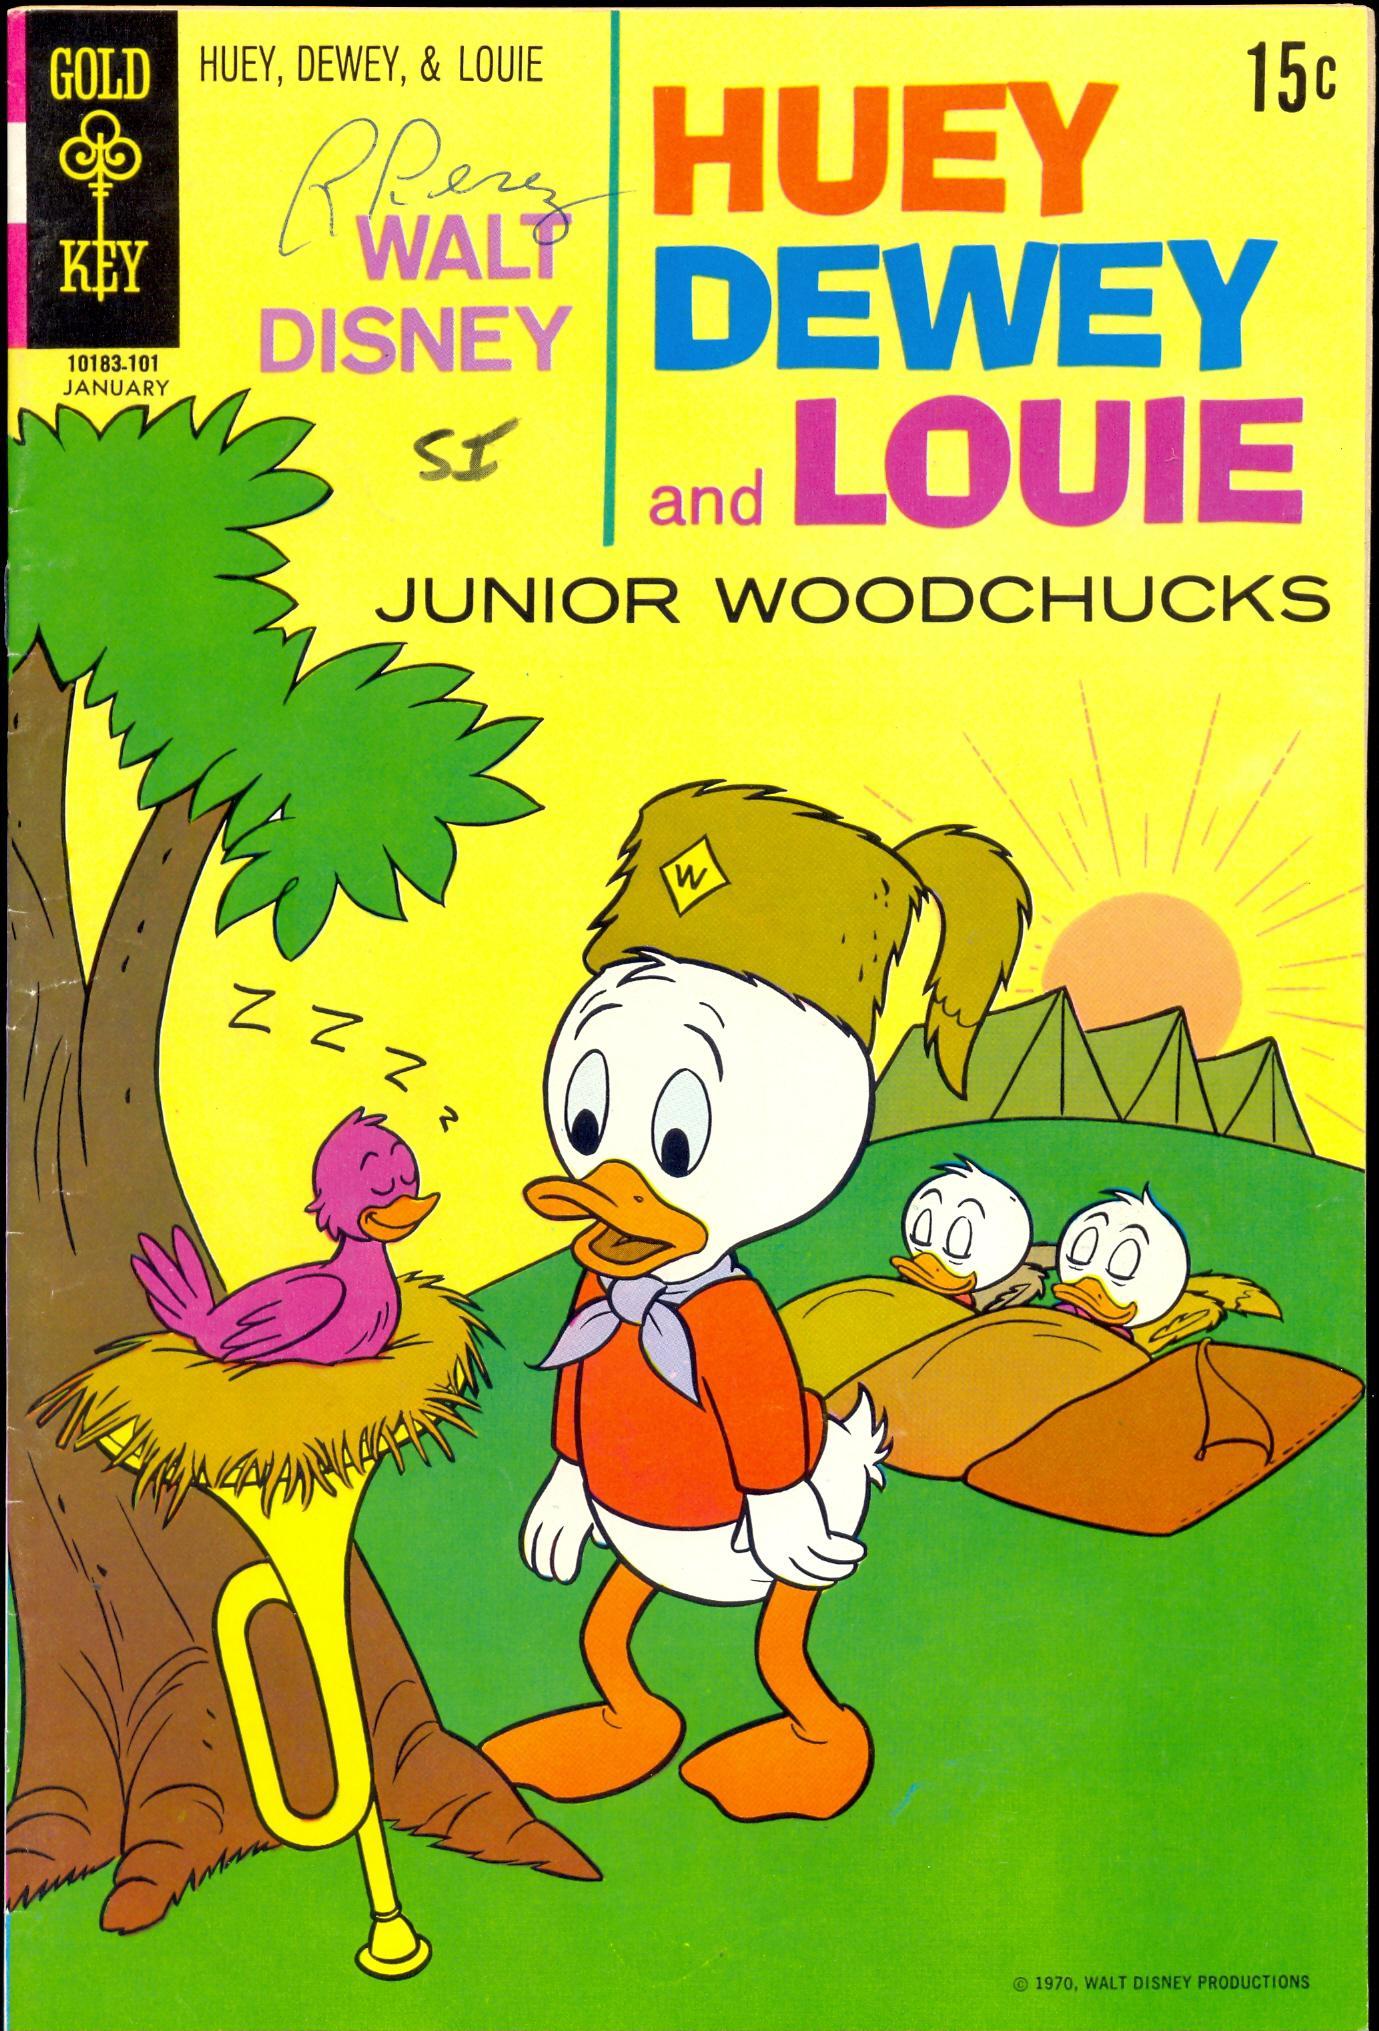 Huey, Dewey, and Louie Junior Woodchucks 8 Page 1